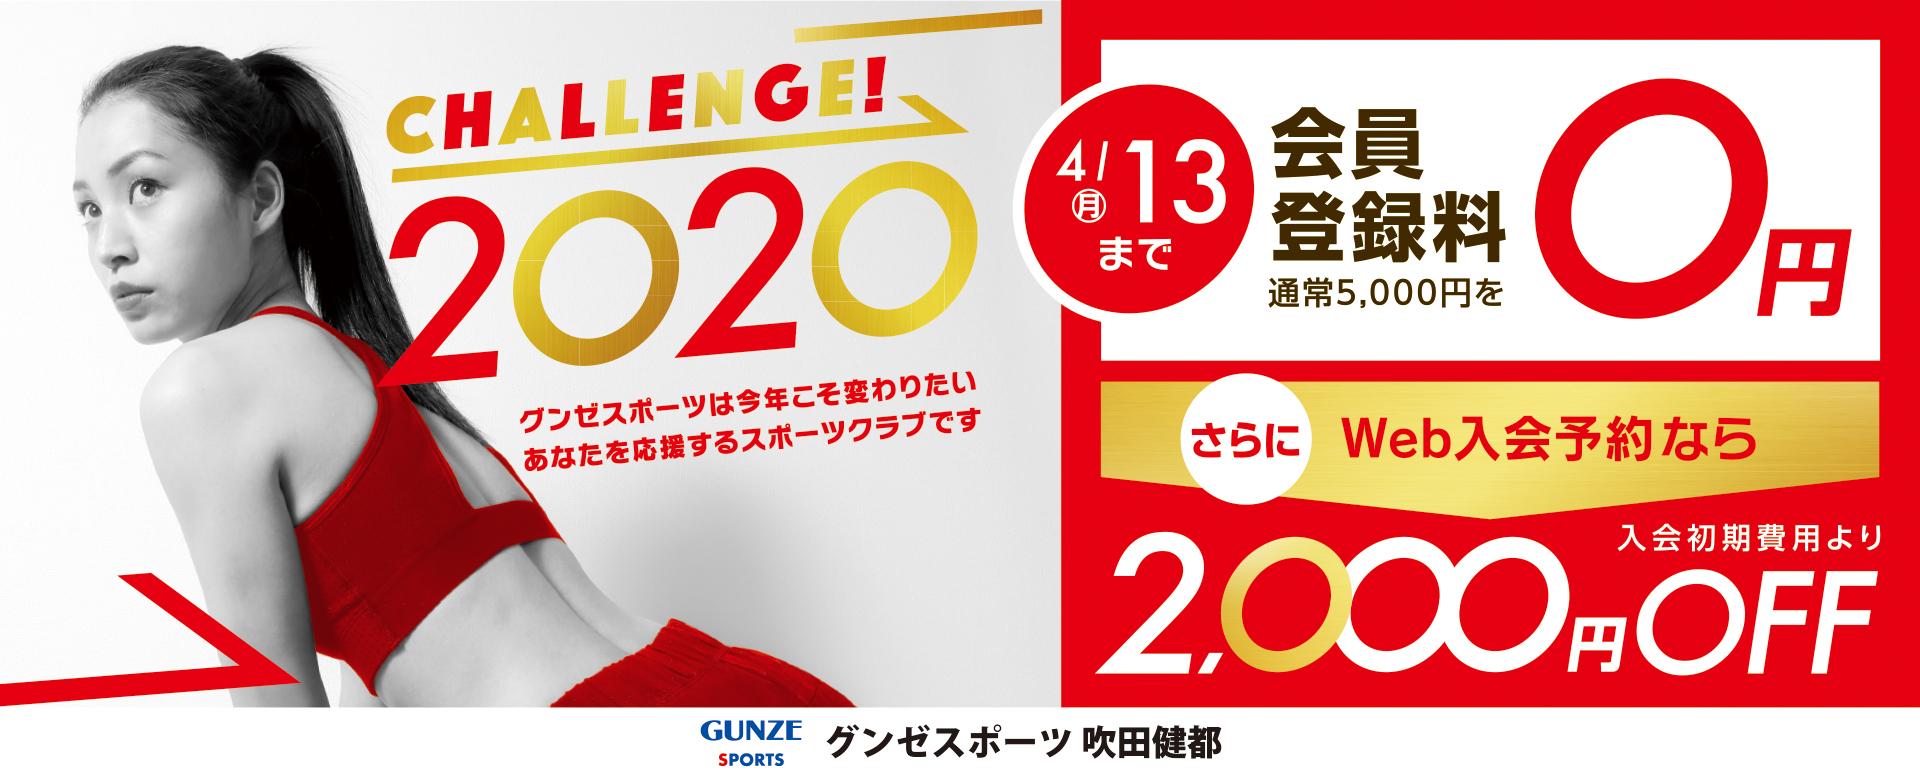 Gunzesports suitakento グンゼスポーツ 吹田健都